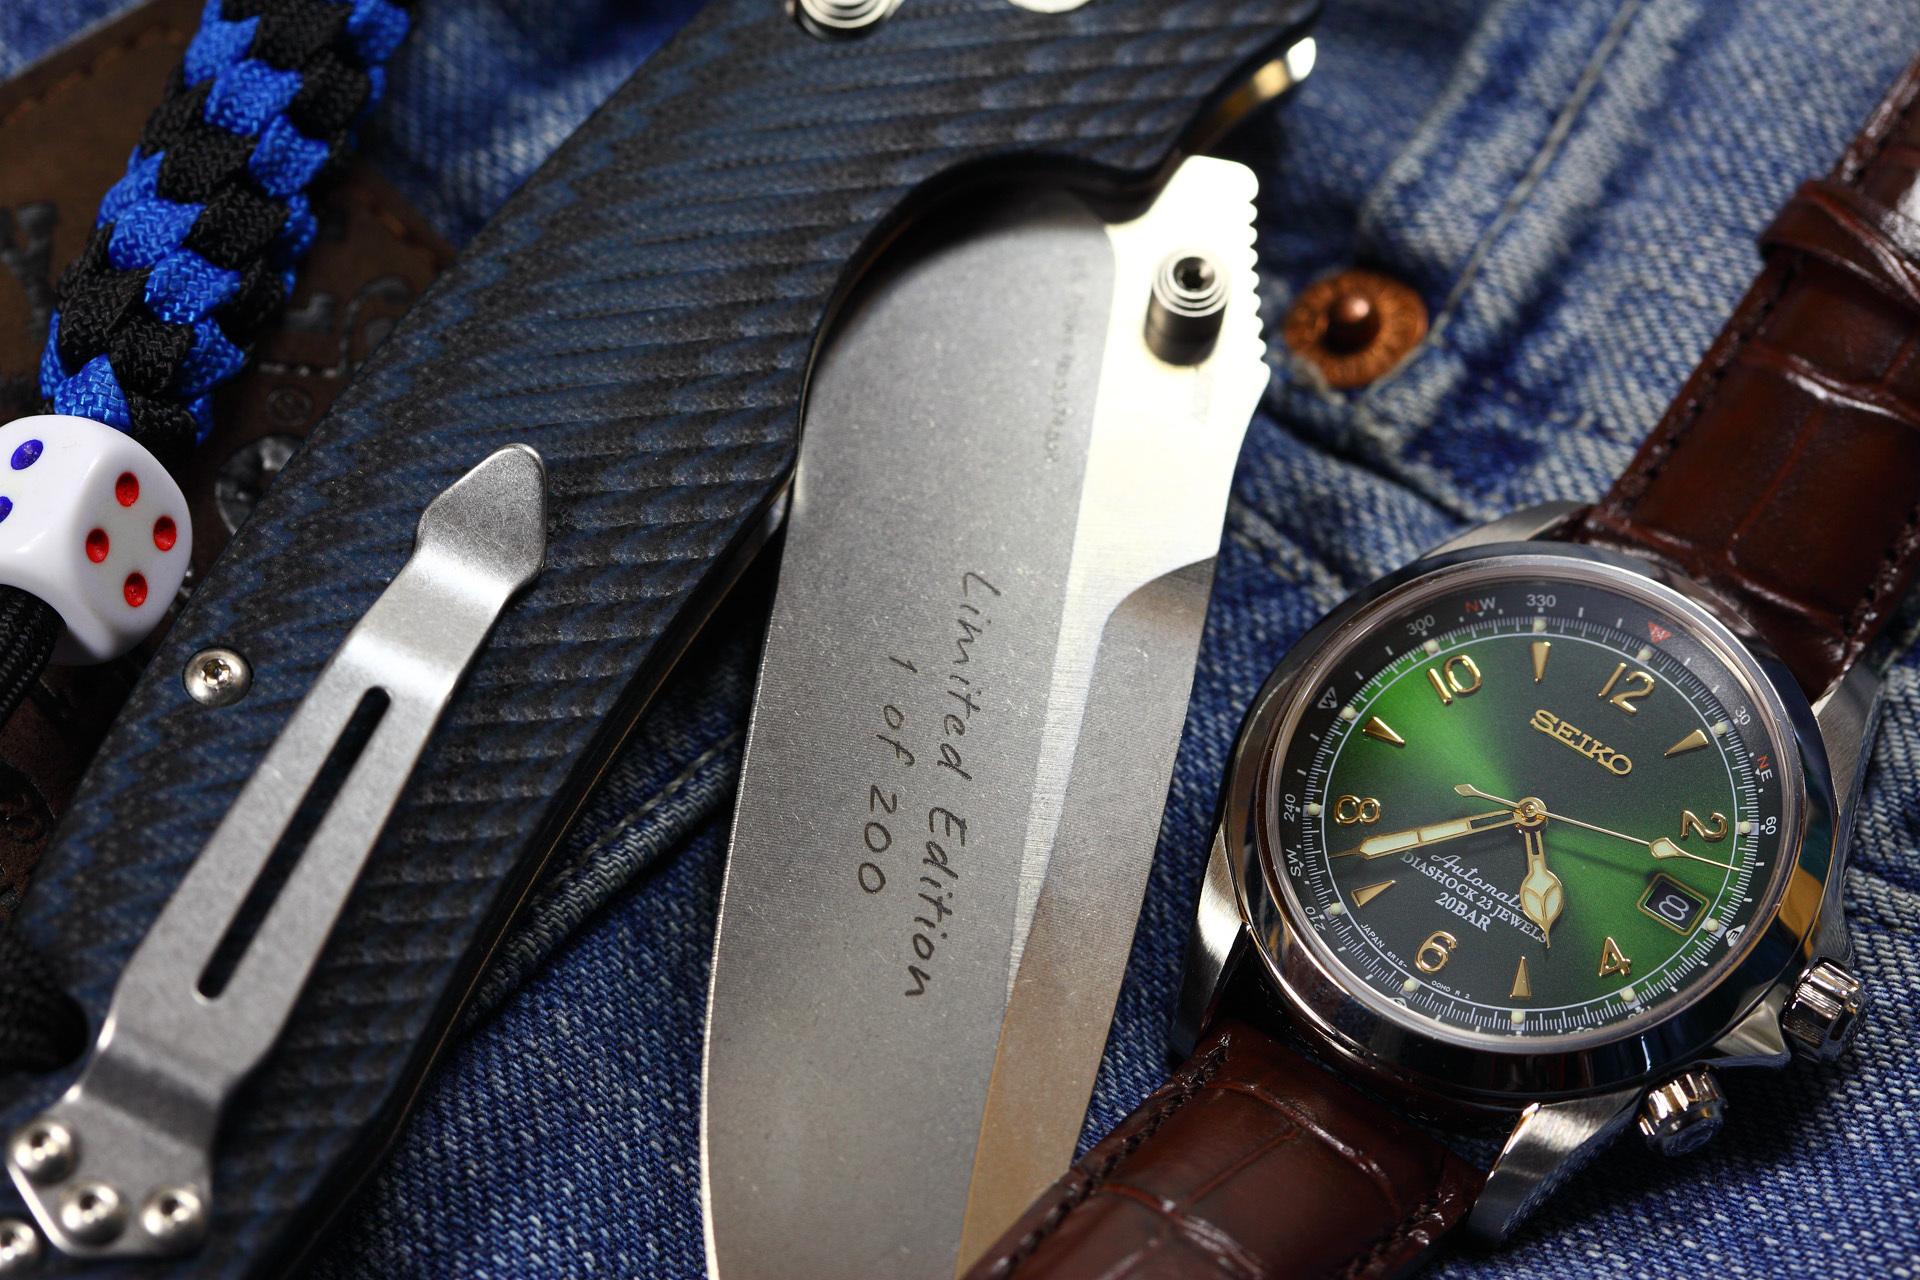 Нож с зажигалкой  № 612845 без смс